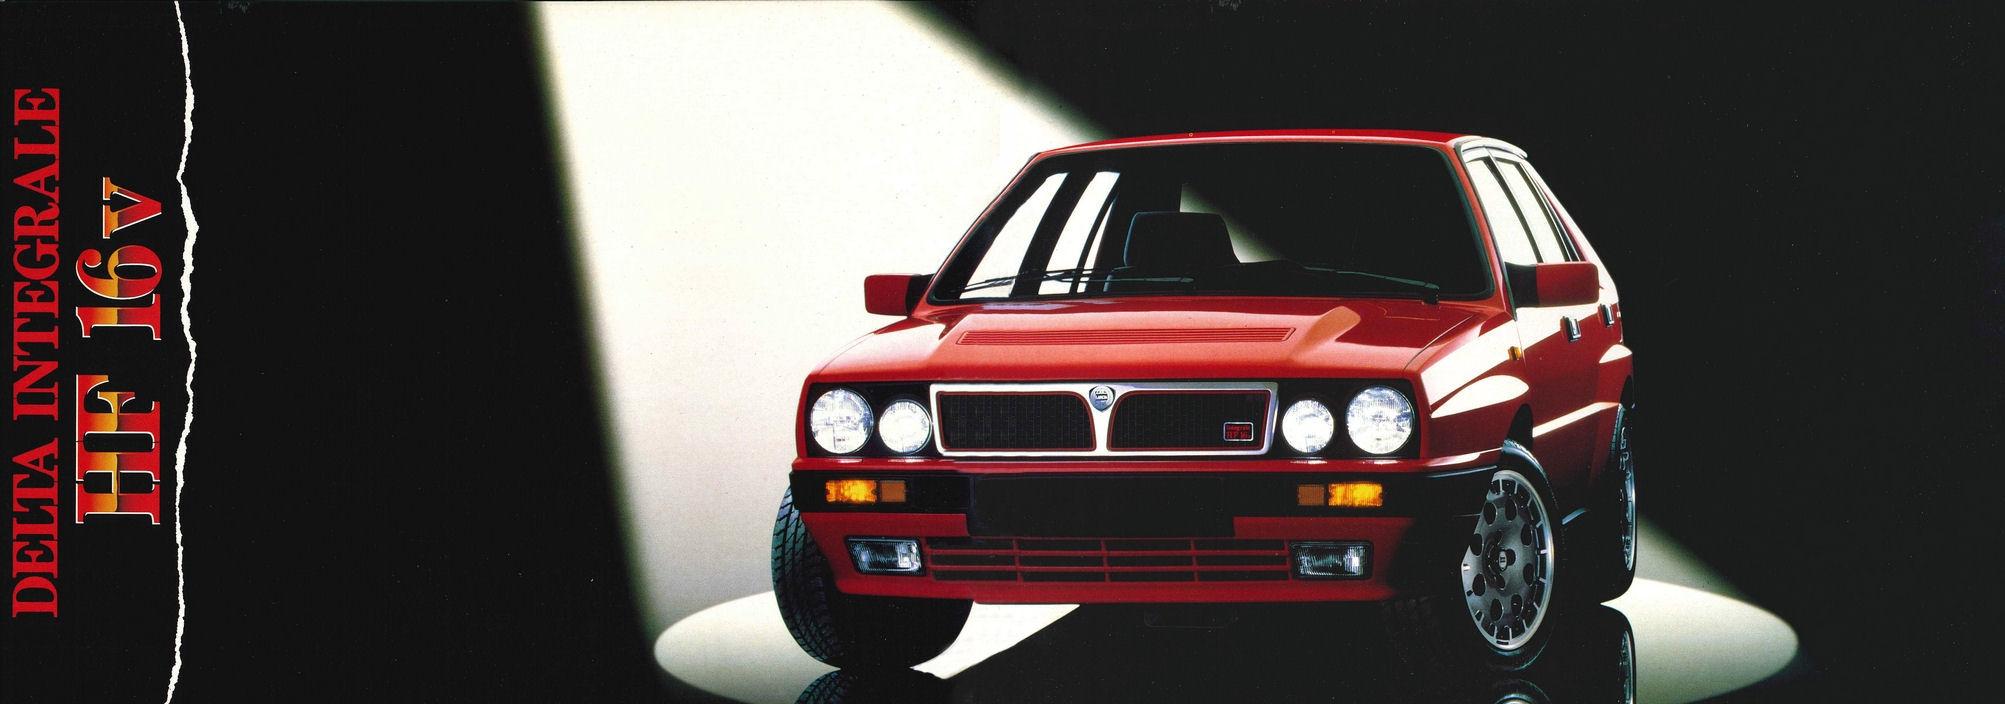 Lancia Delta Hf Integrale Concept besides Img Wa as well Lancia Hf Bdfa Fd also Lancia Delta Hfr Integrale Ii together with Hqdefault. on lancia delta integrale